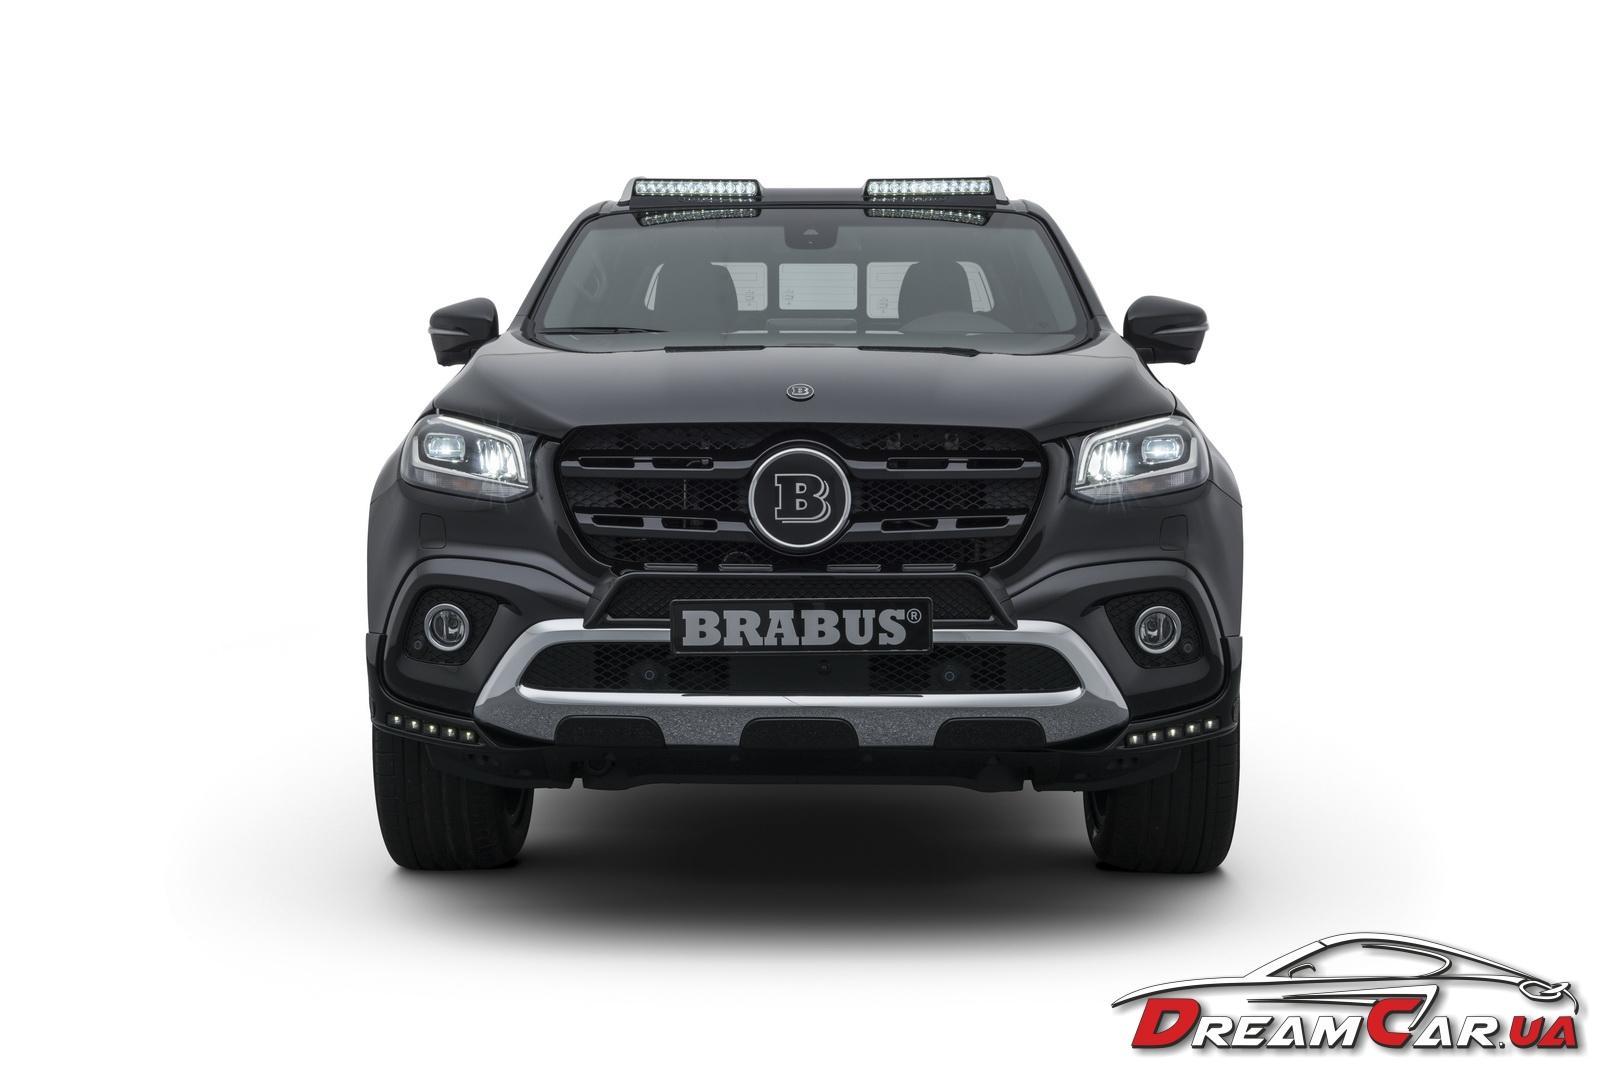 Brabus-Mercedes-Benz-X-Class-12